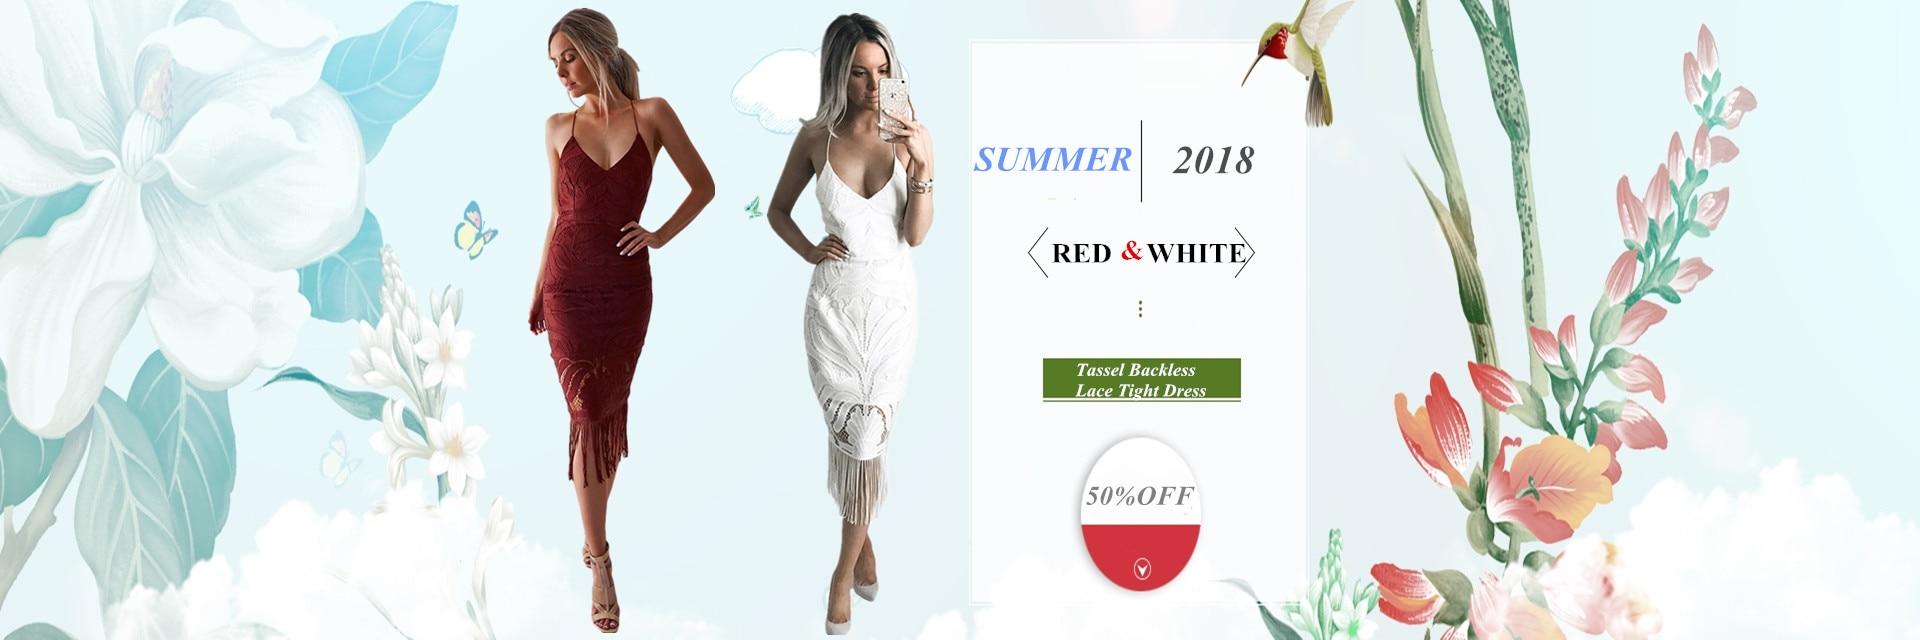 ЛЕТНИЕ ПЛАТЬЯ 2018. La Chilly Winter Fall Dresses For ... aa62945a6e26